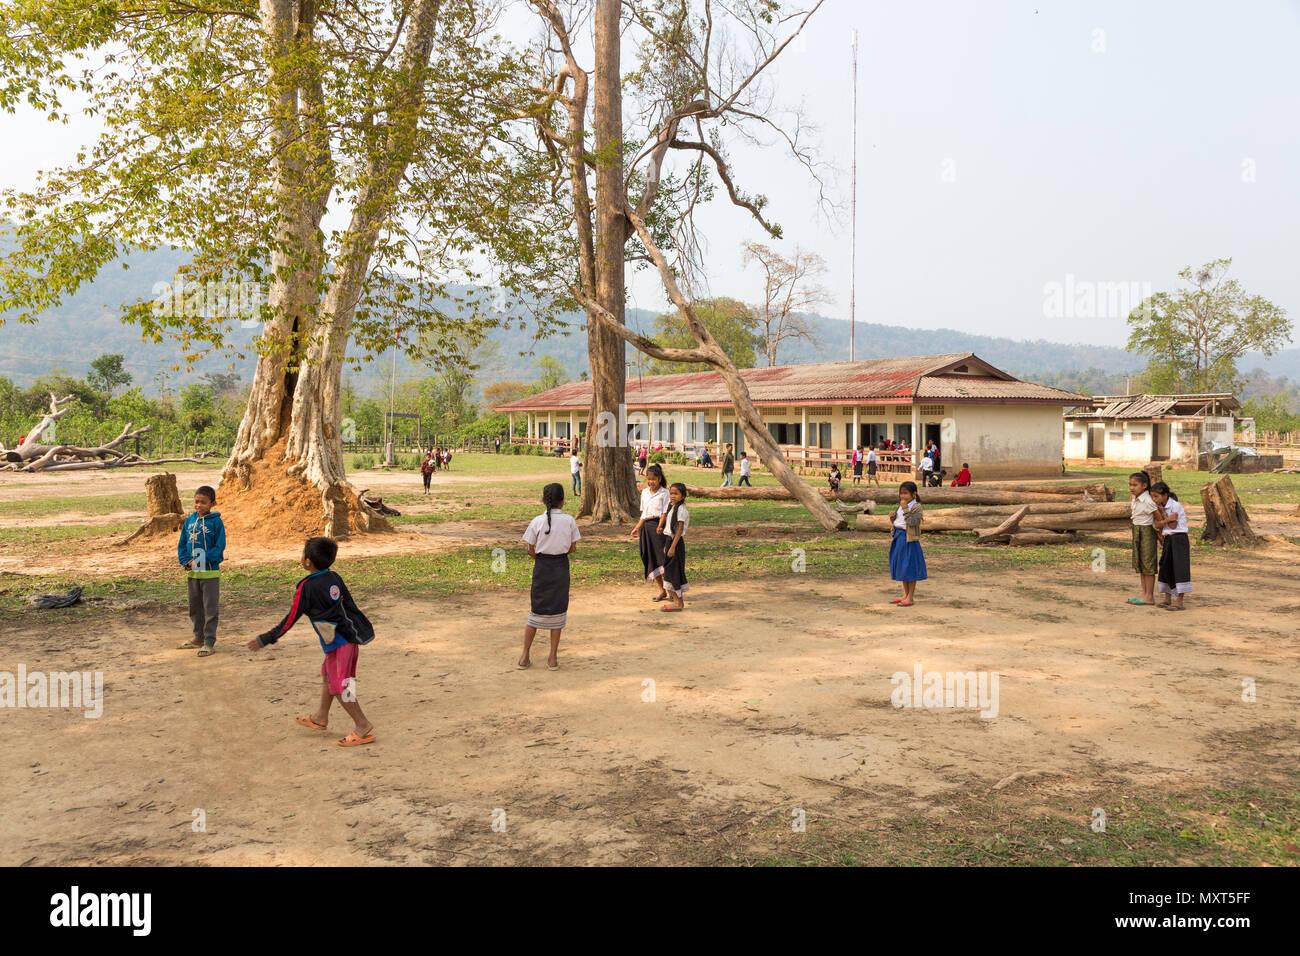 School children, Nong Ping village, Laos - Stock Image